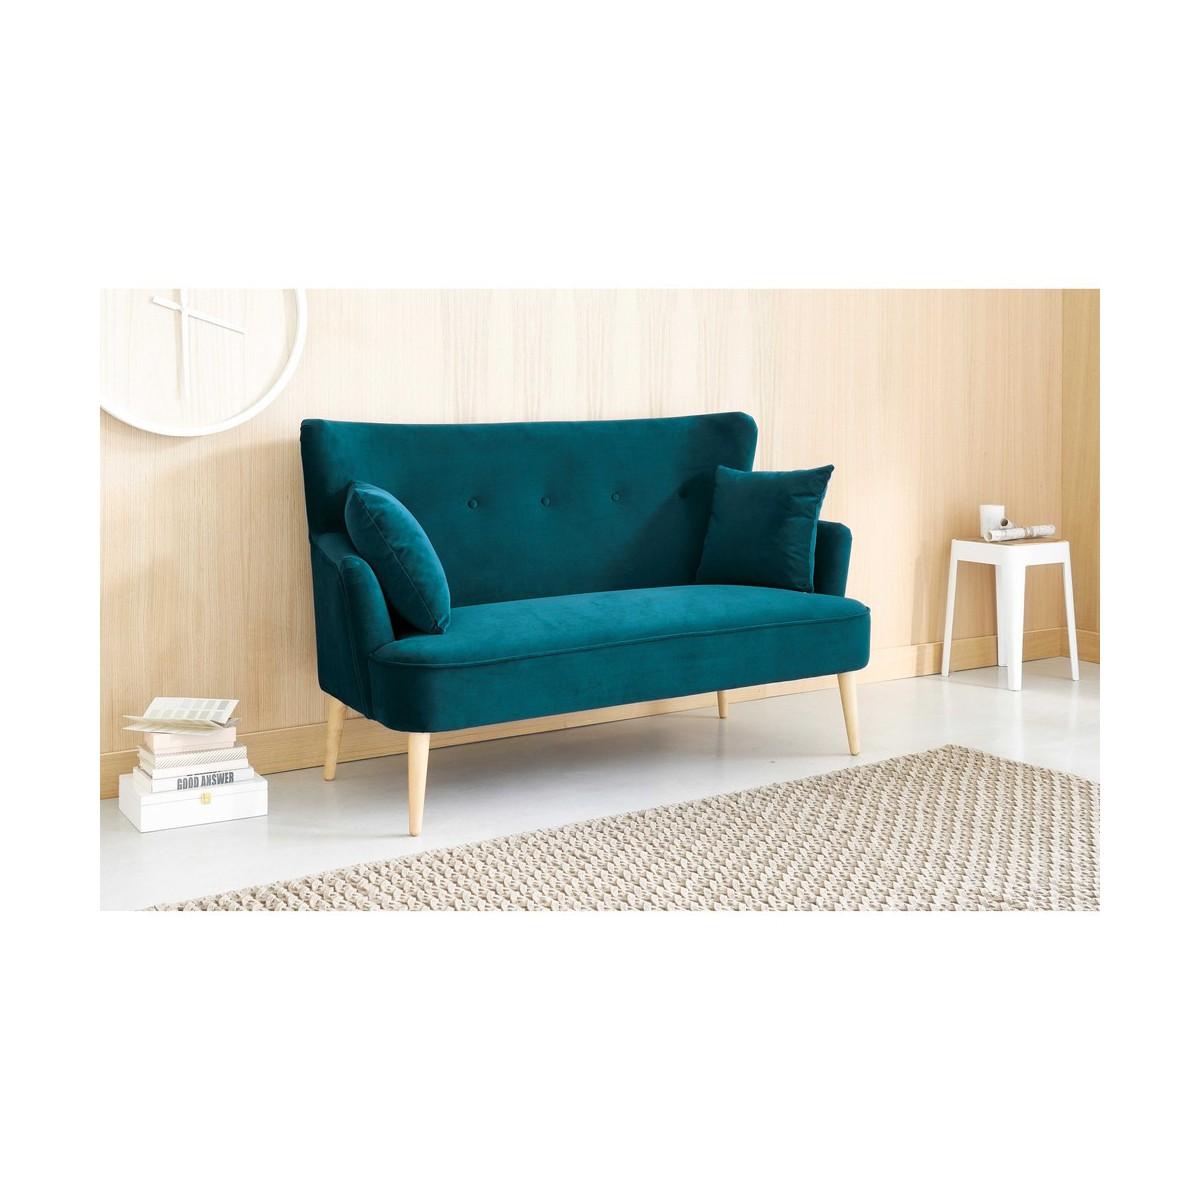 canap bleu ptrole latest ptrole l canap places fifties bleu canard l with canap bleu ptrole. Black Bedroom Furniture Sets. Home Design Ideas